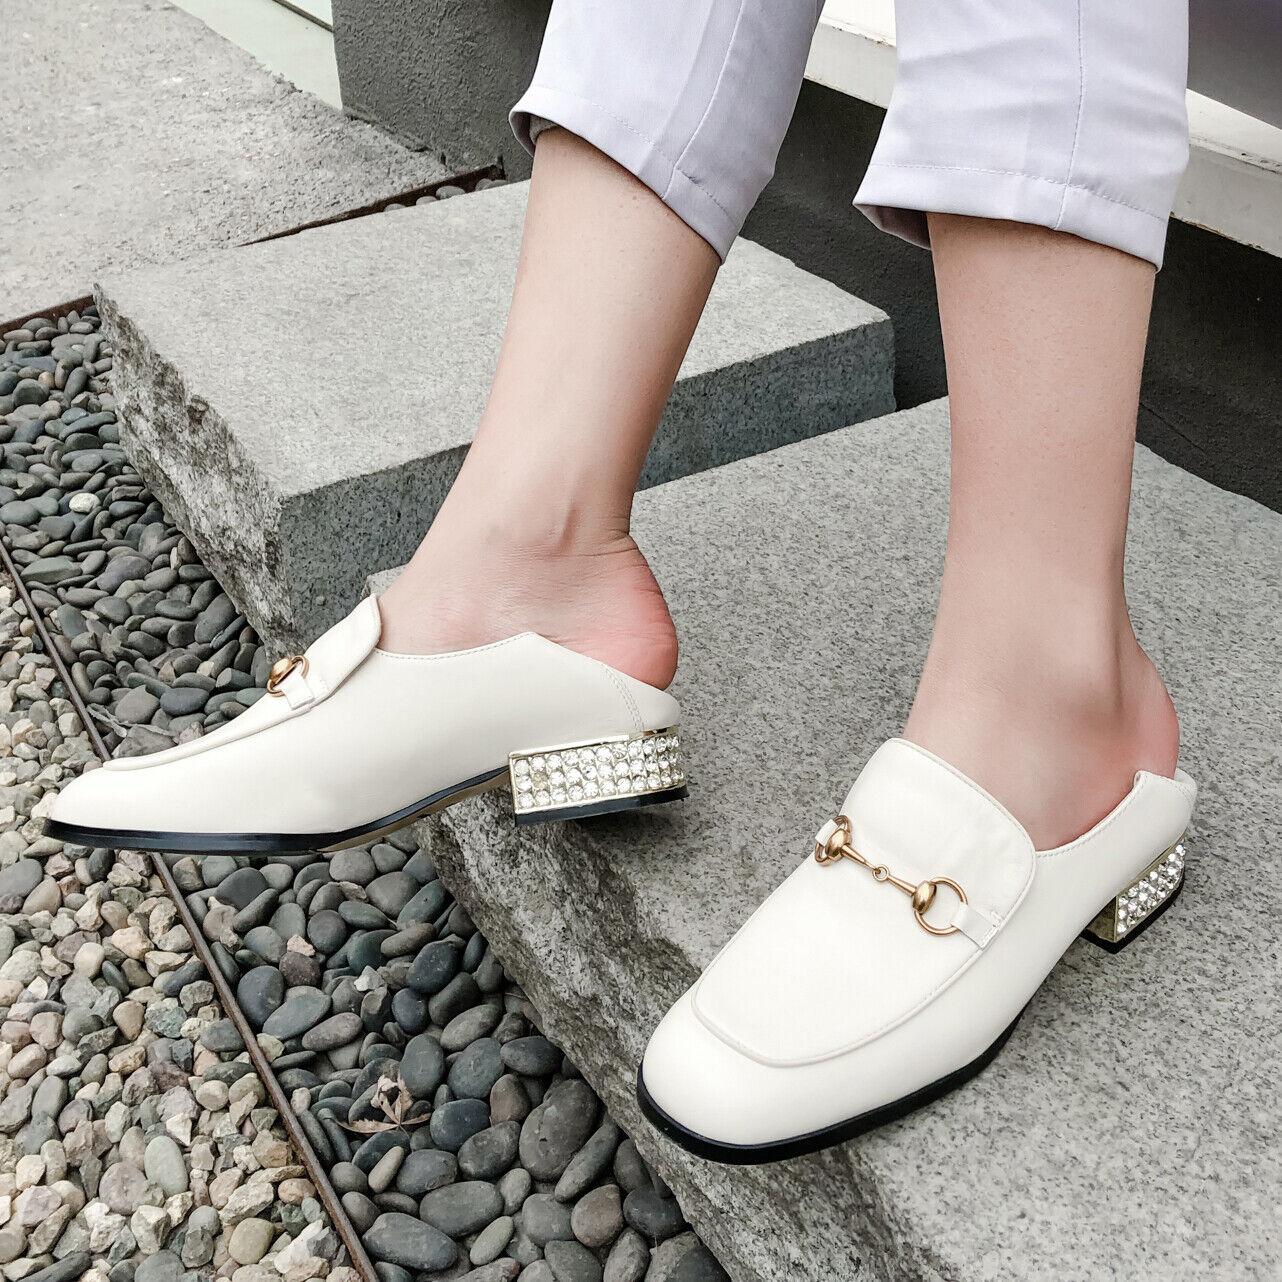 Block Low Heel Womens Slip On Horsebit shoes Loafers Pumps Leather Retro Fashion